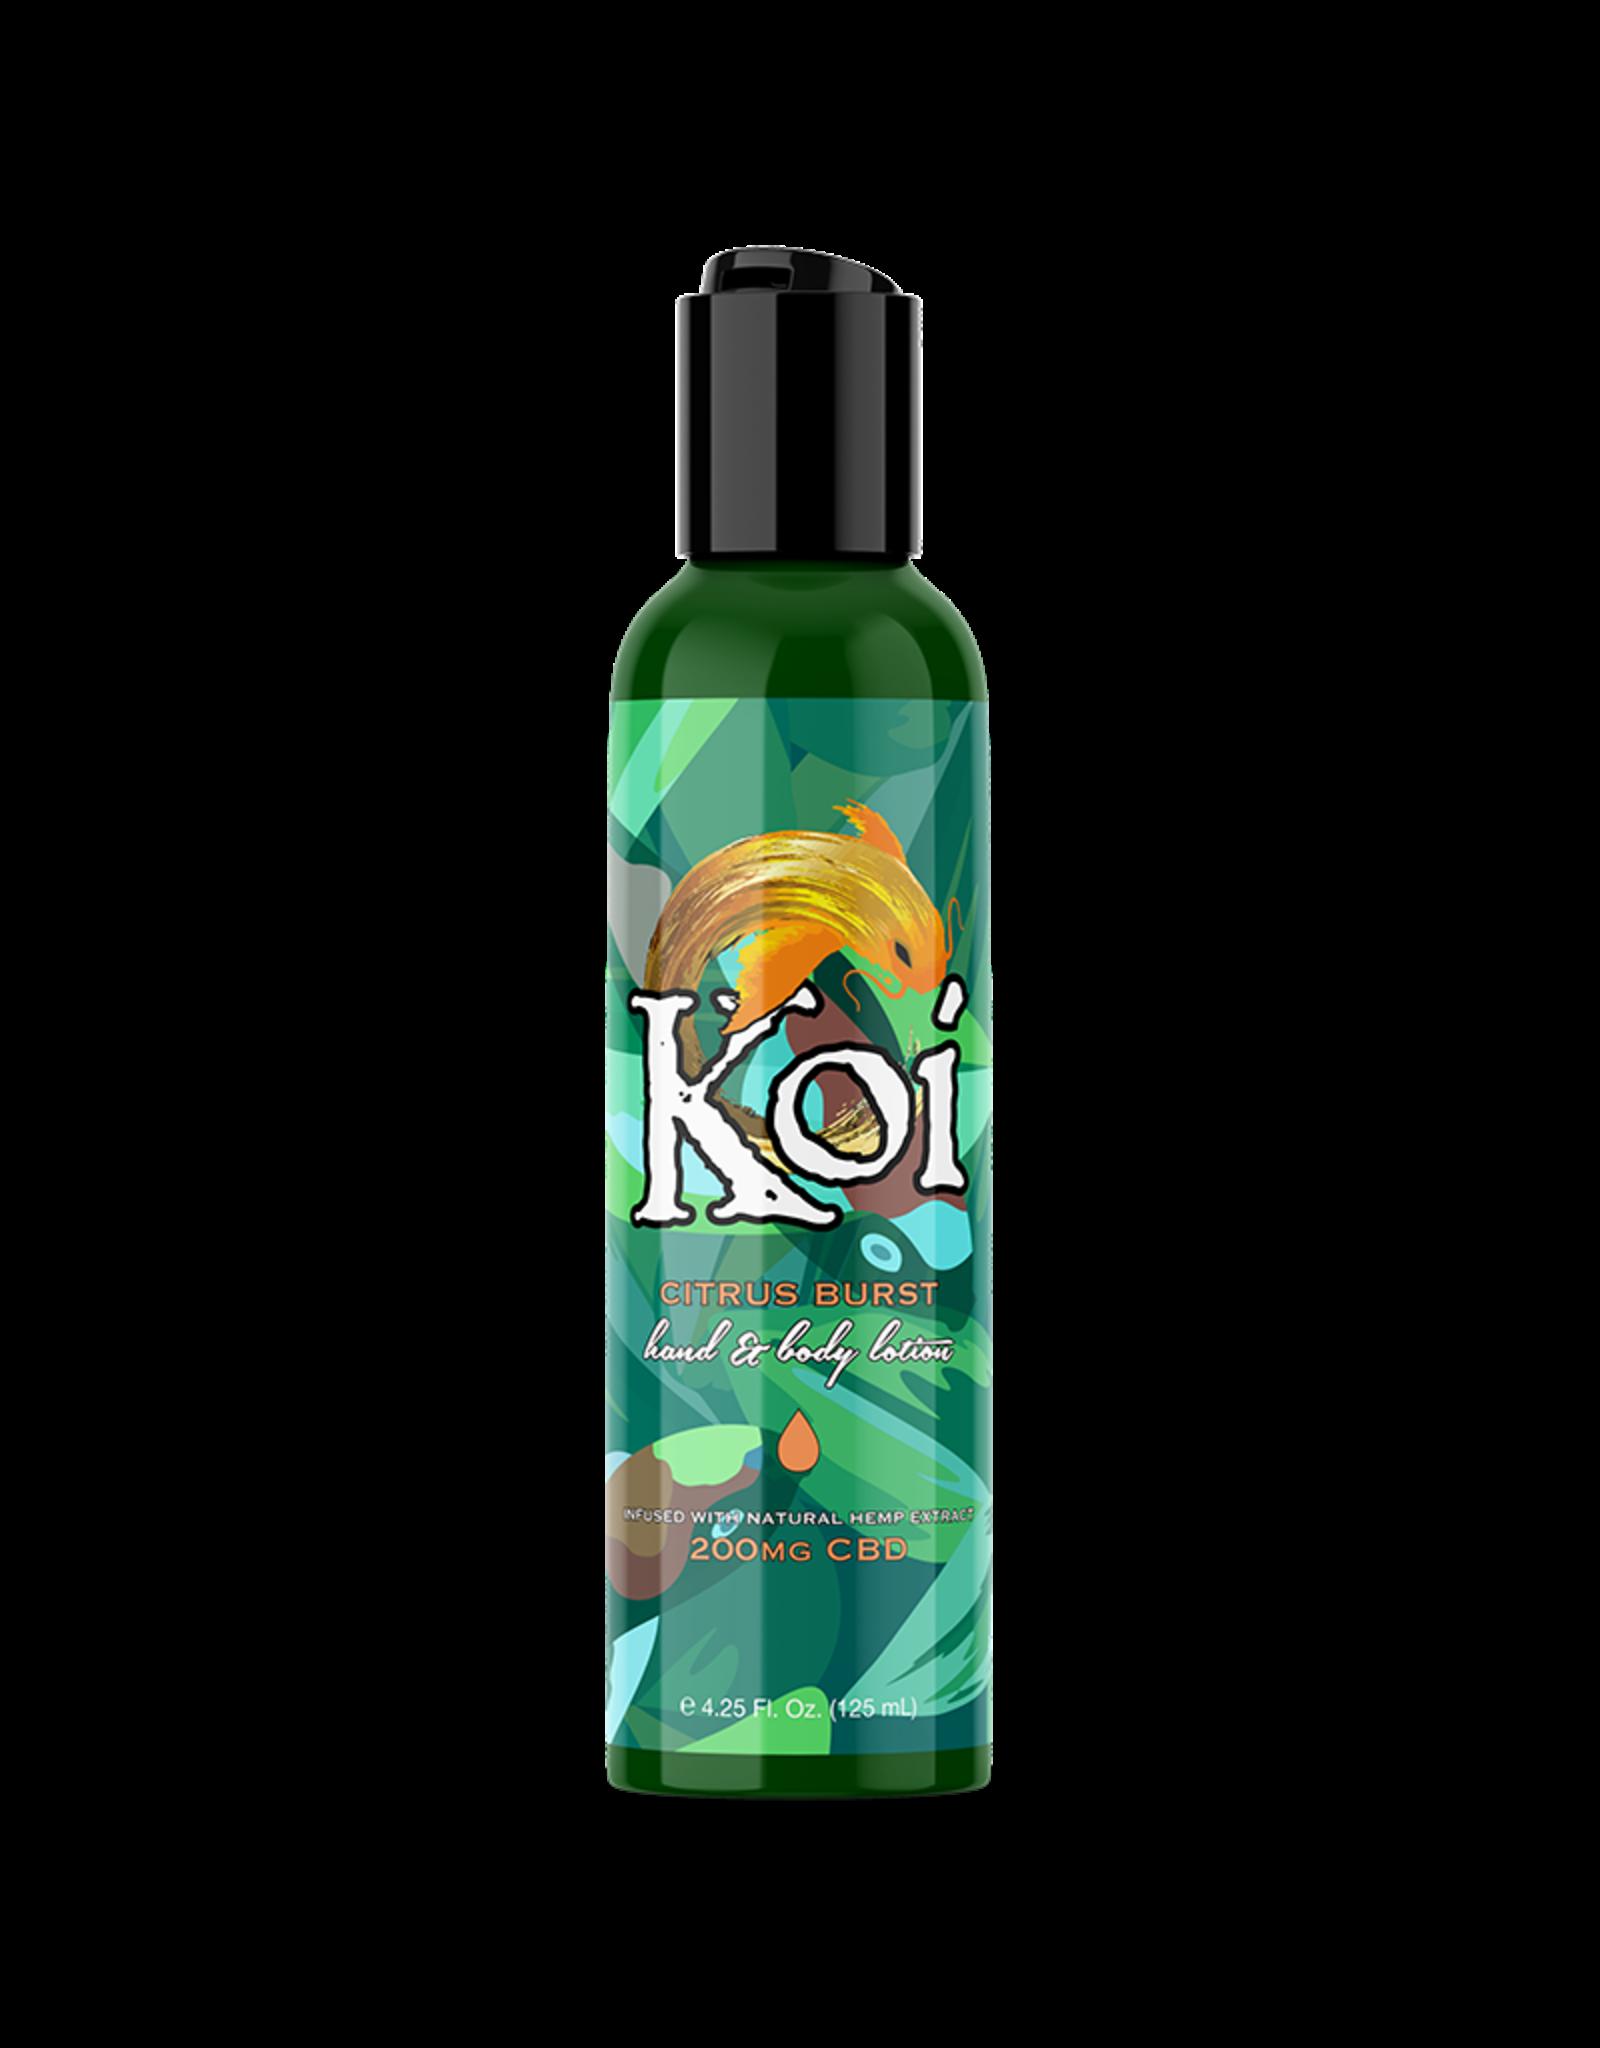 Koi CBD KOI Citrus Hand and Body Lotion 200mg